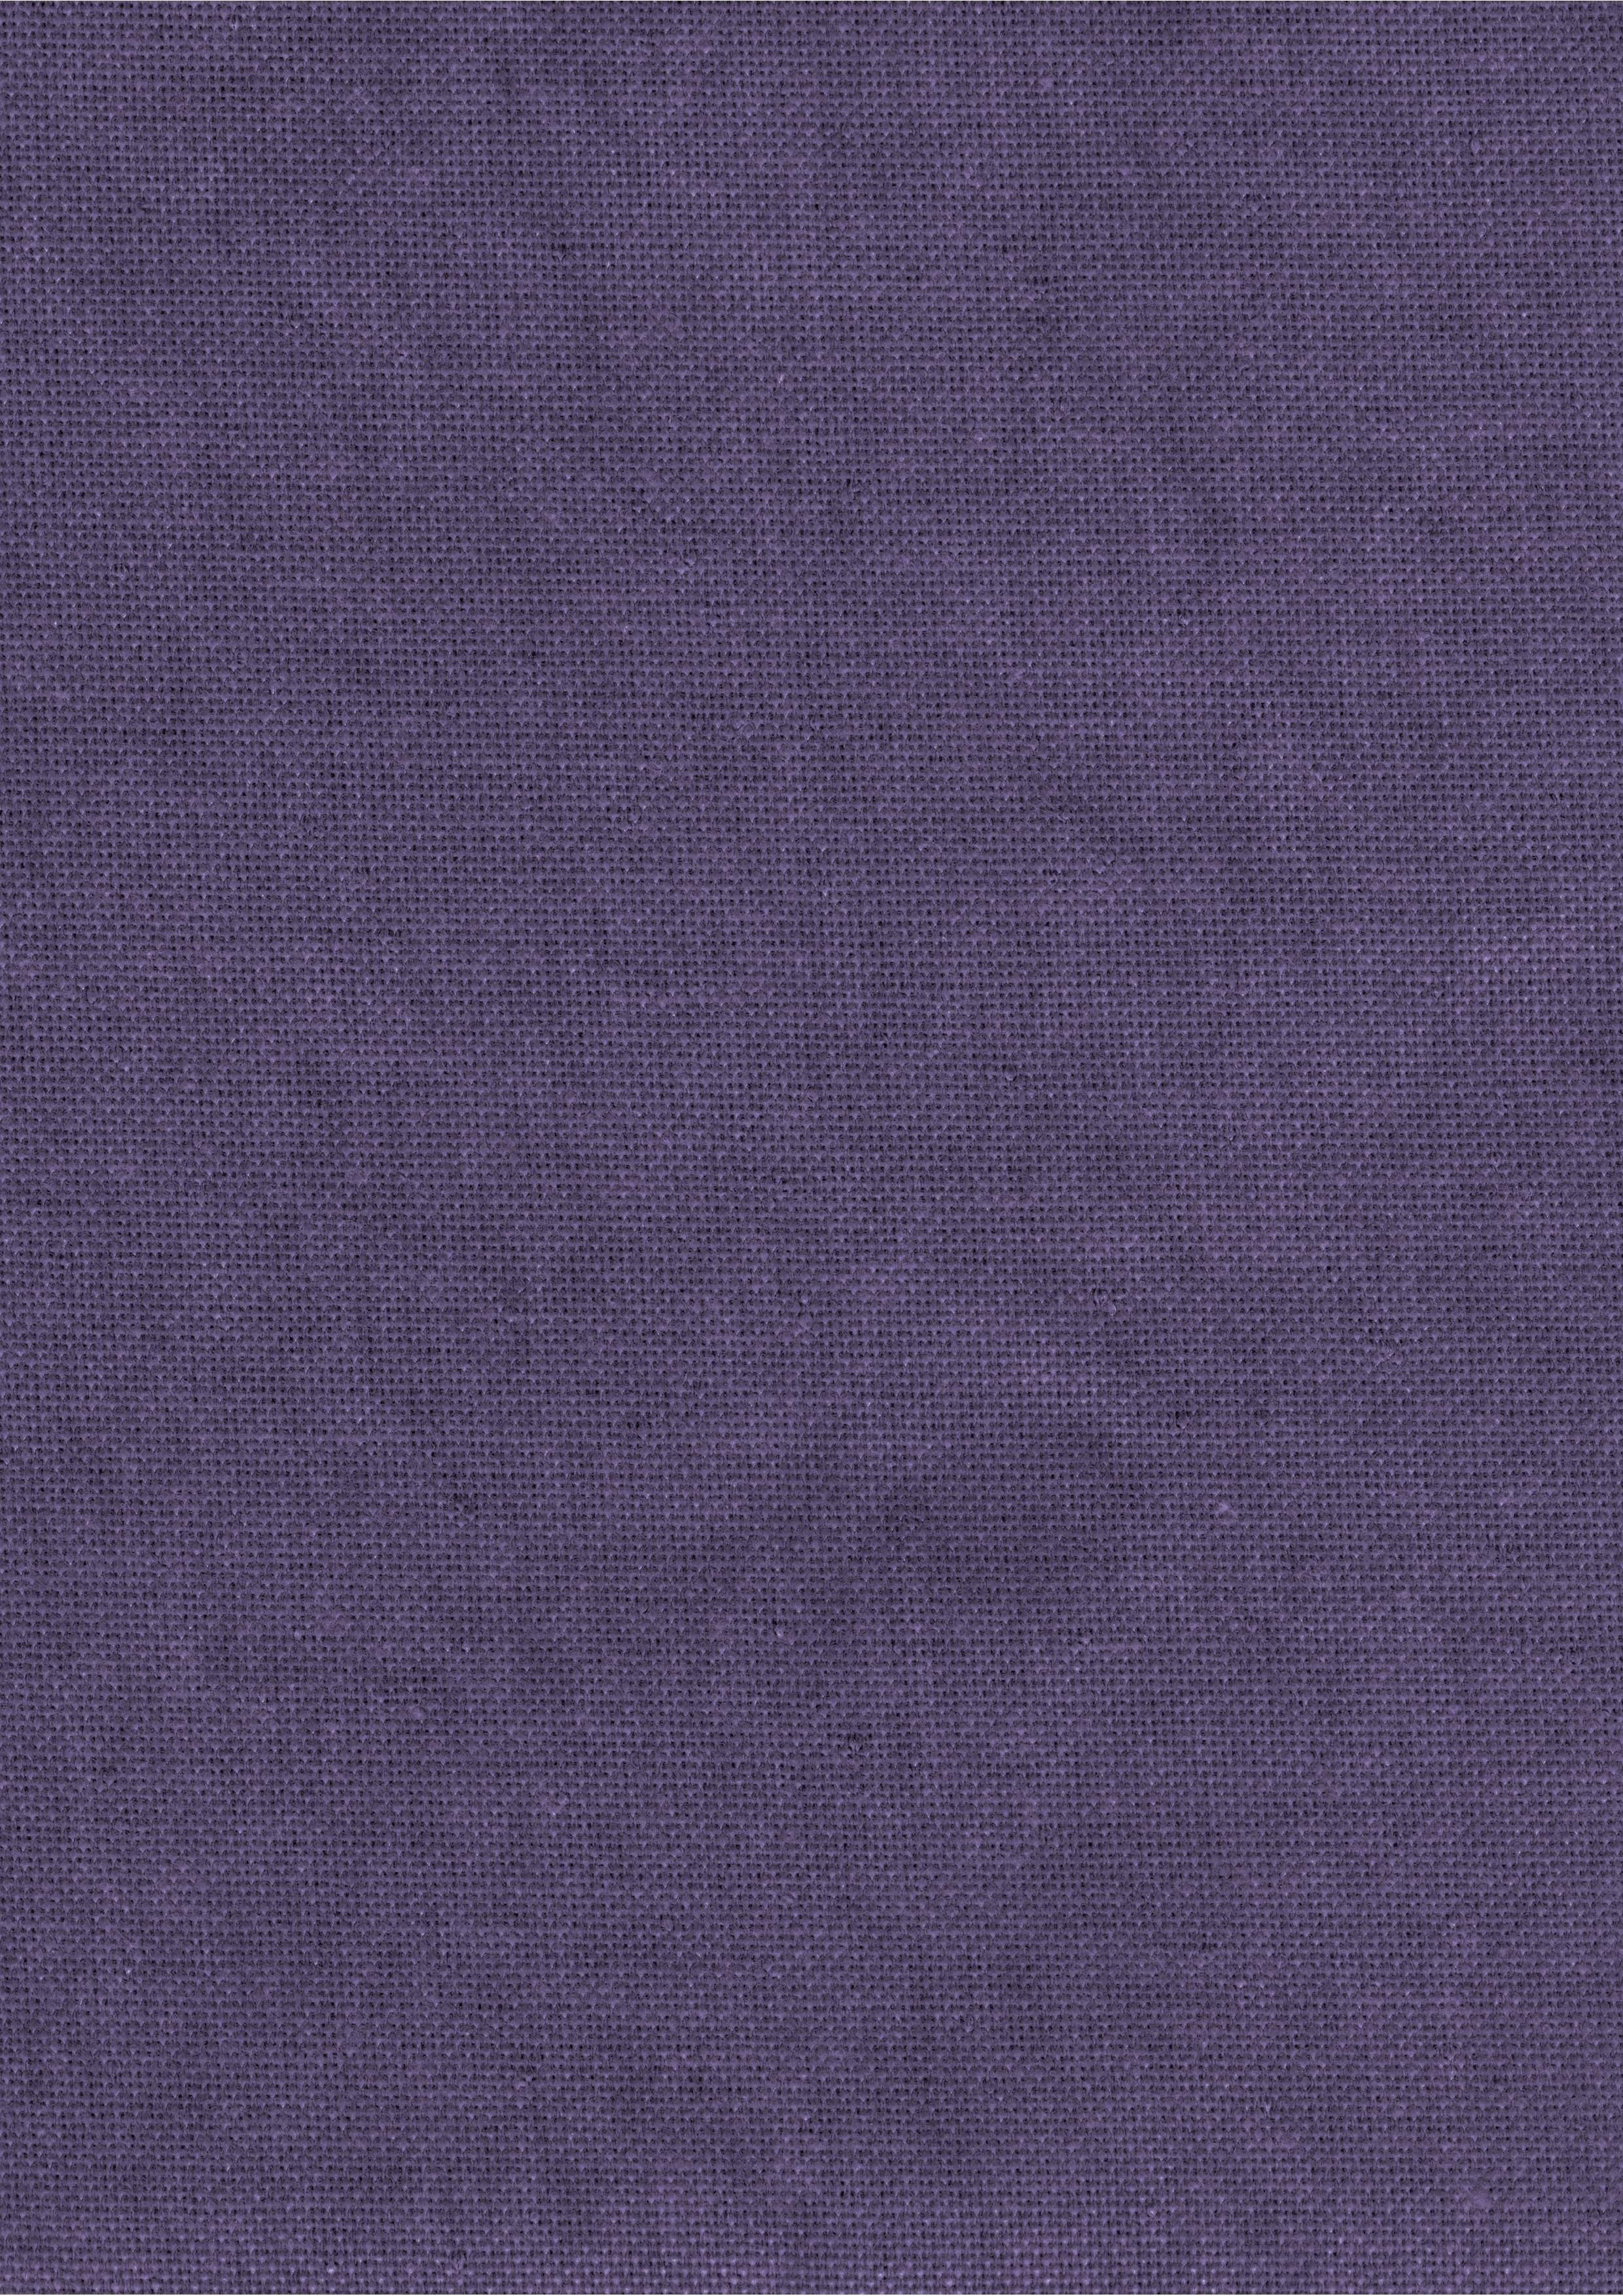 Fotos Gratis Textura Cuerda P 250 Rpura Pared Floral